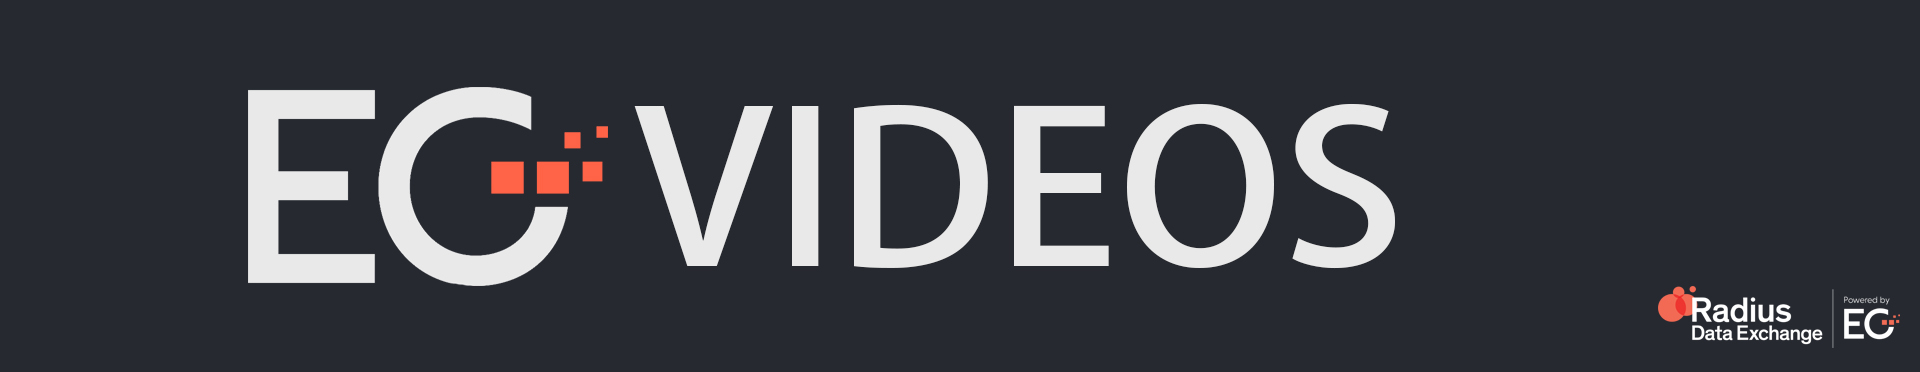 EG videos logo